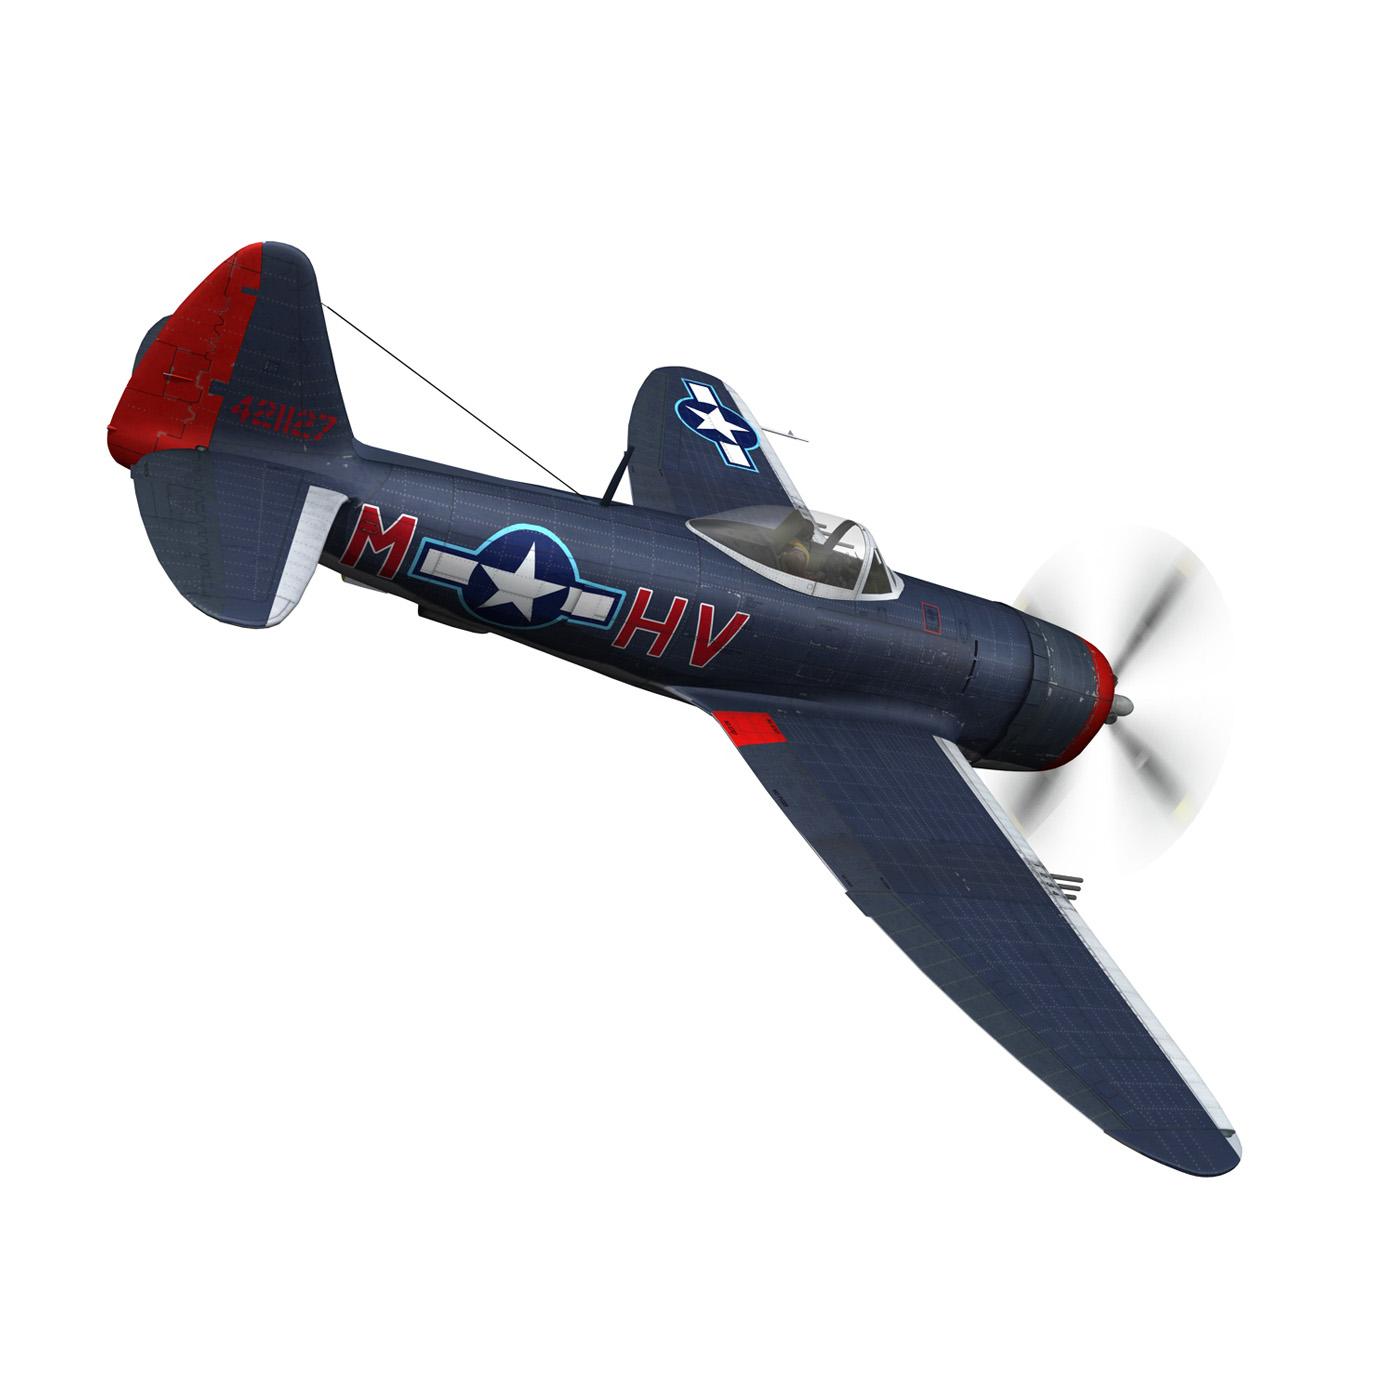 republic p-47m thunderbolt – pengie v 3d model 3ds c4d fbx lwo lw lws obj 279721